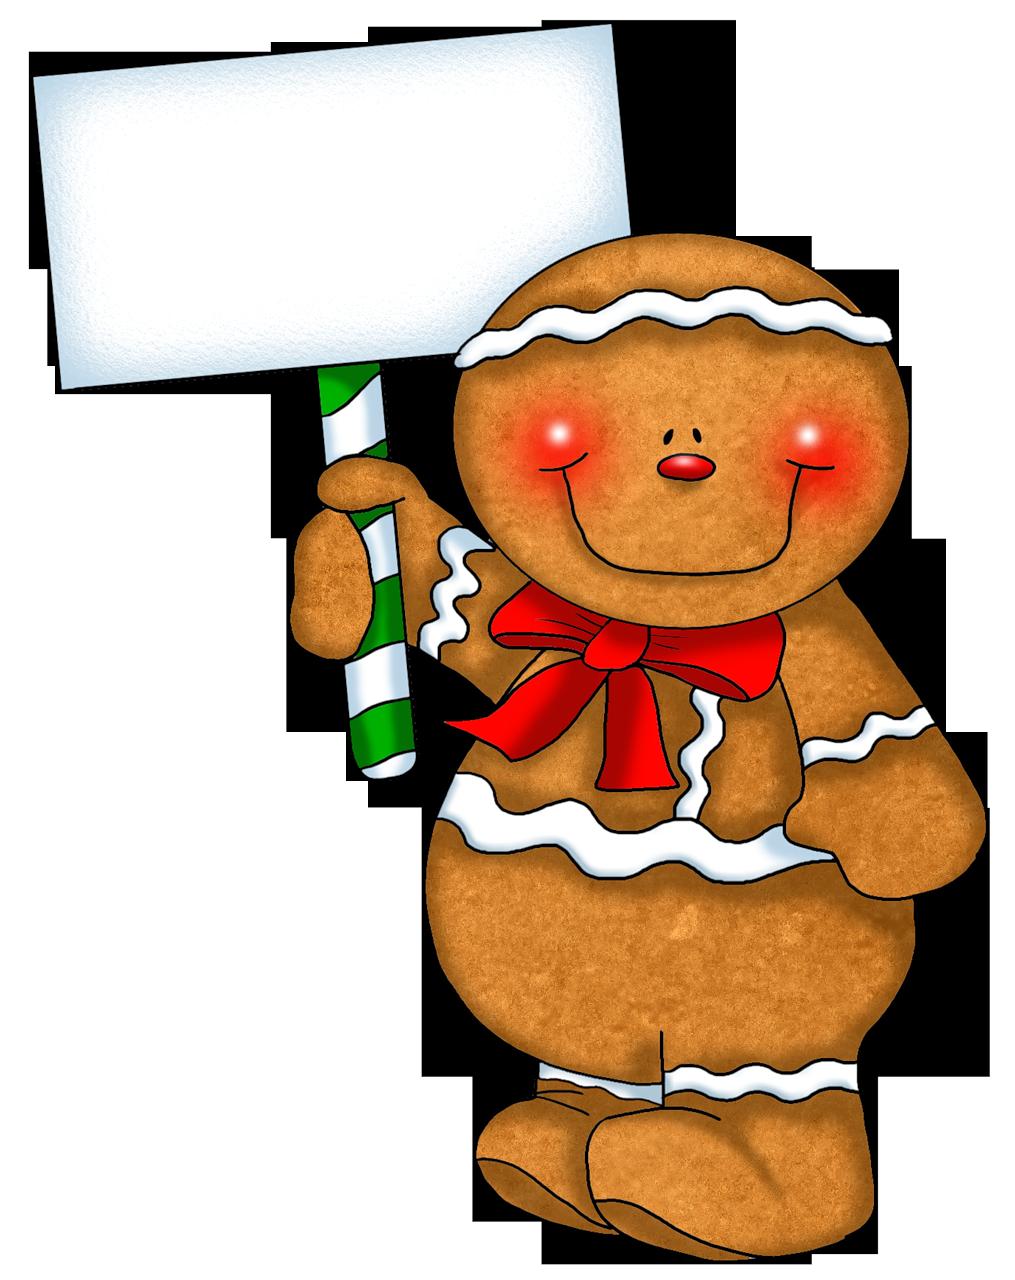 Fridge clipart man. Transparent gingerbread ornament with